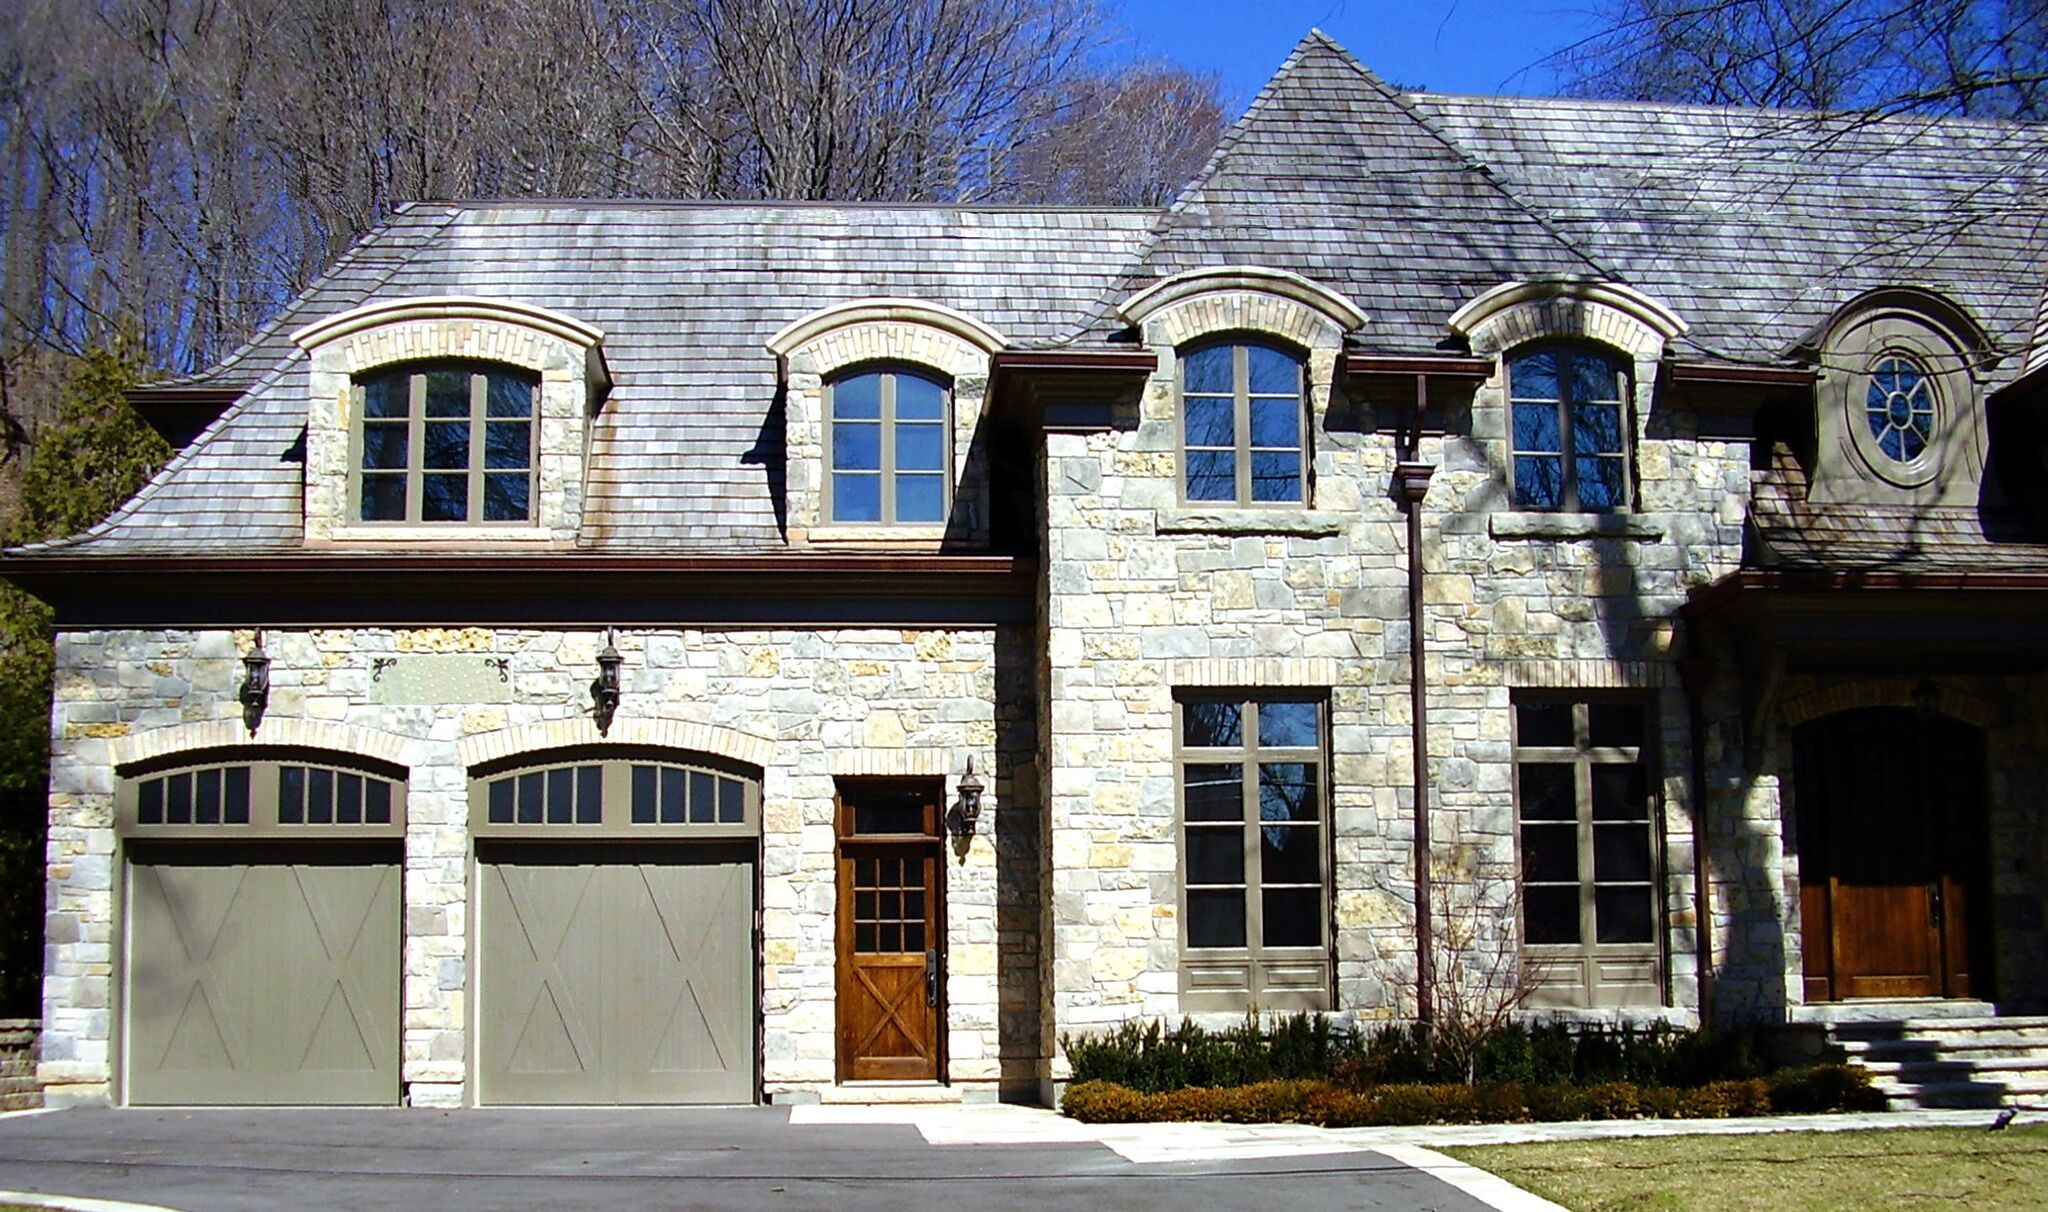 Creative-Door-stone-house